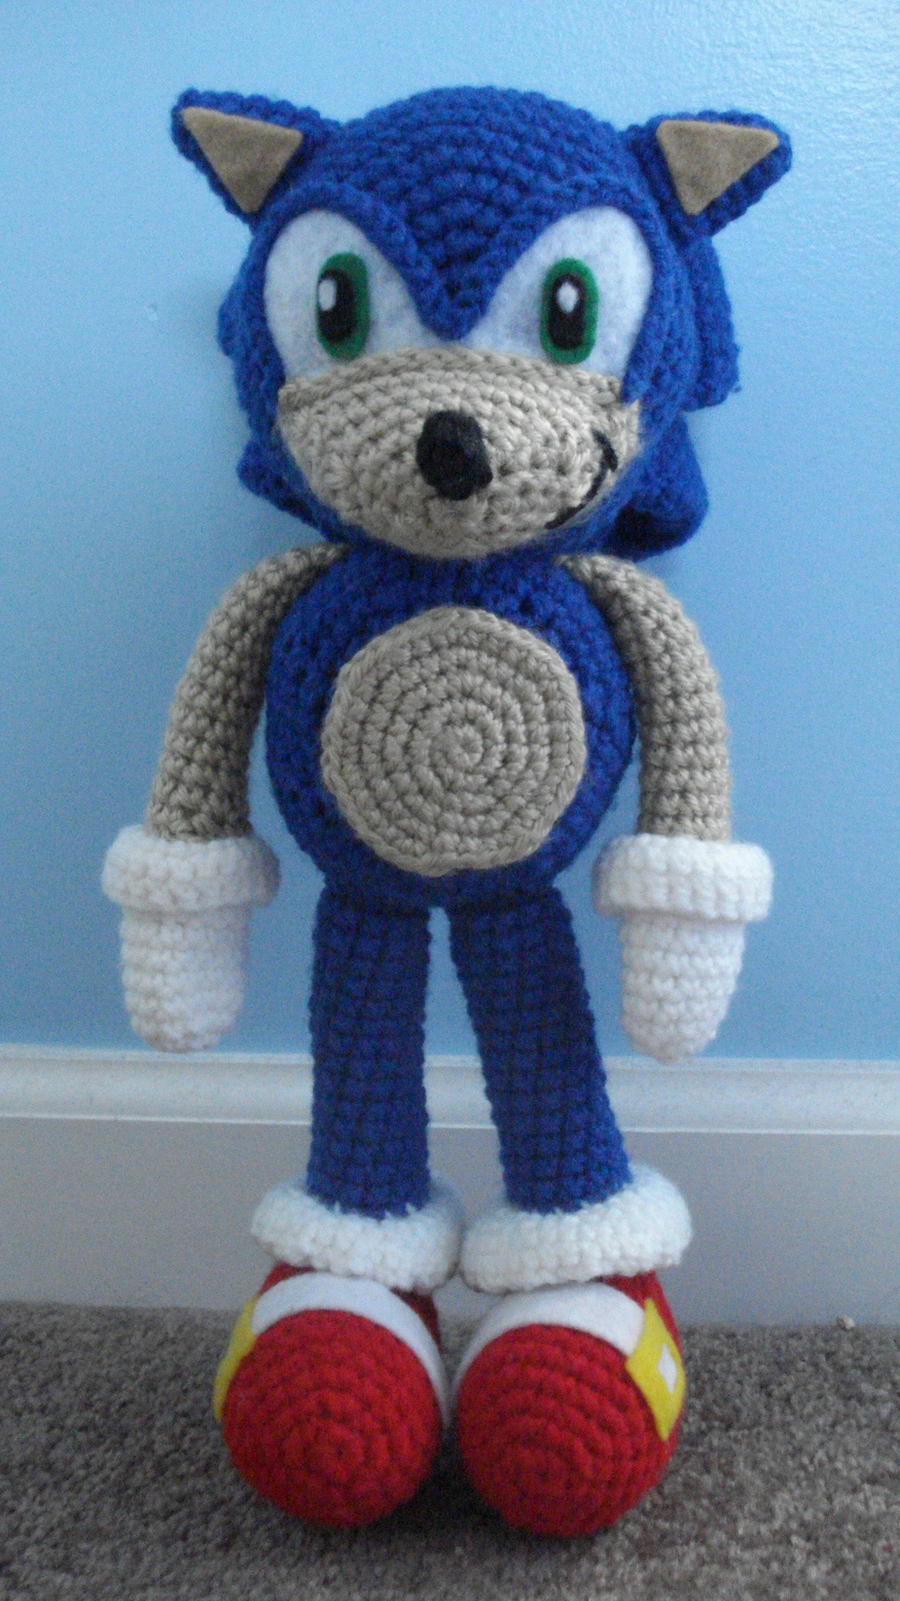 Amigurumi Hedgehog : sonic the hedgehog amigurumi by TheArtisansNook on DeviantArt